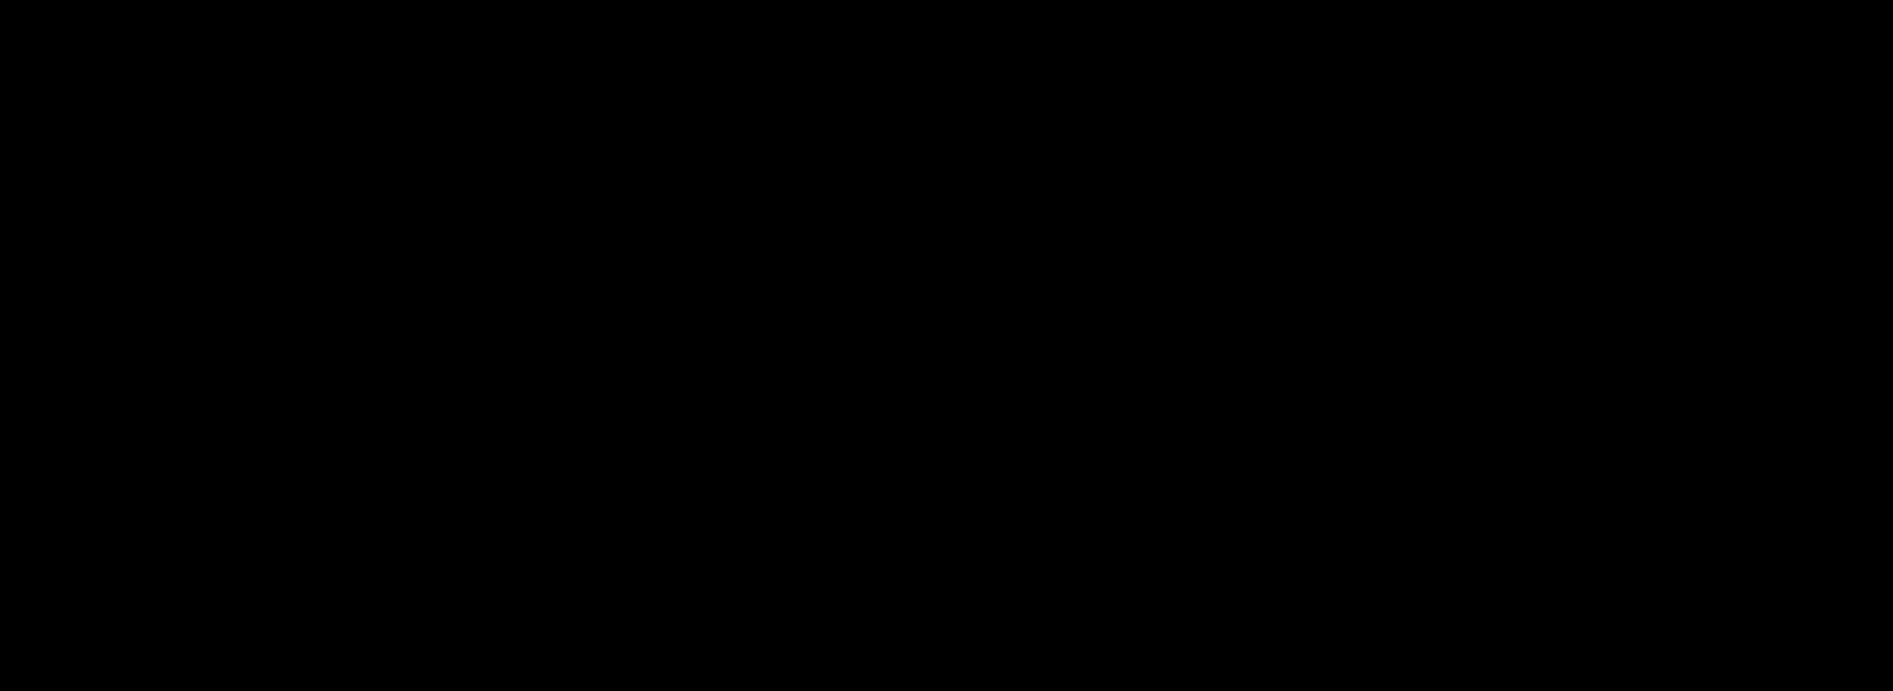 SeekPng.com_ark-logo-png_1959210.png